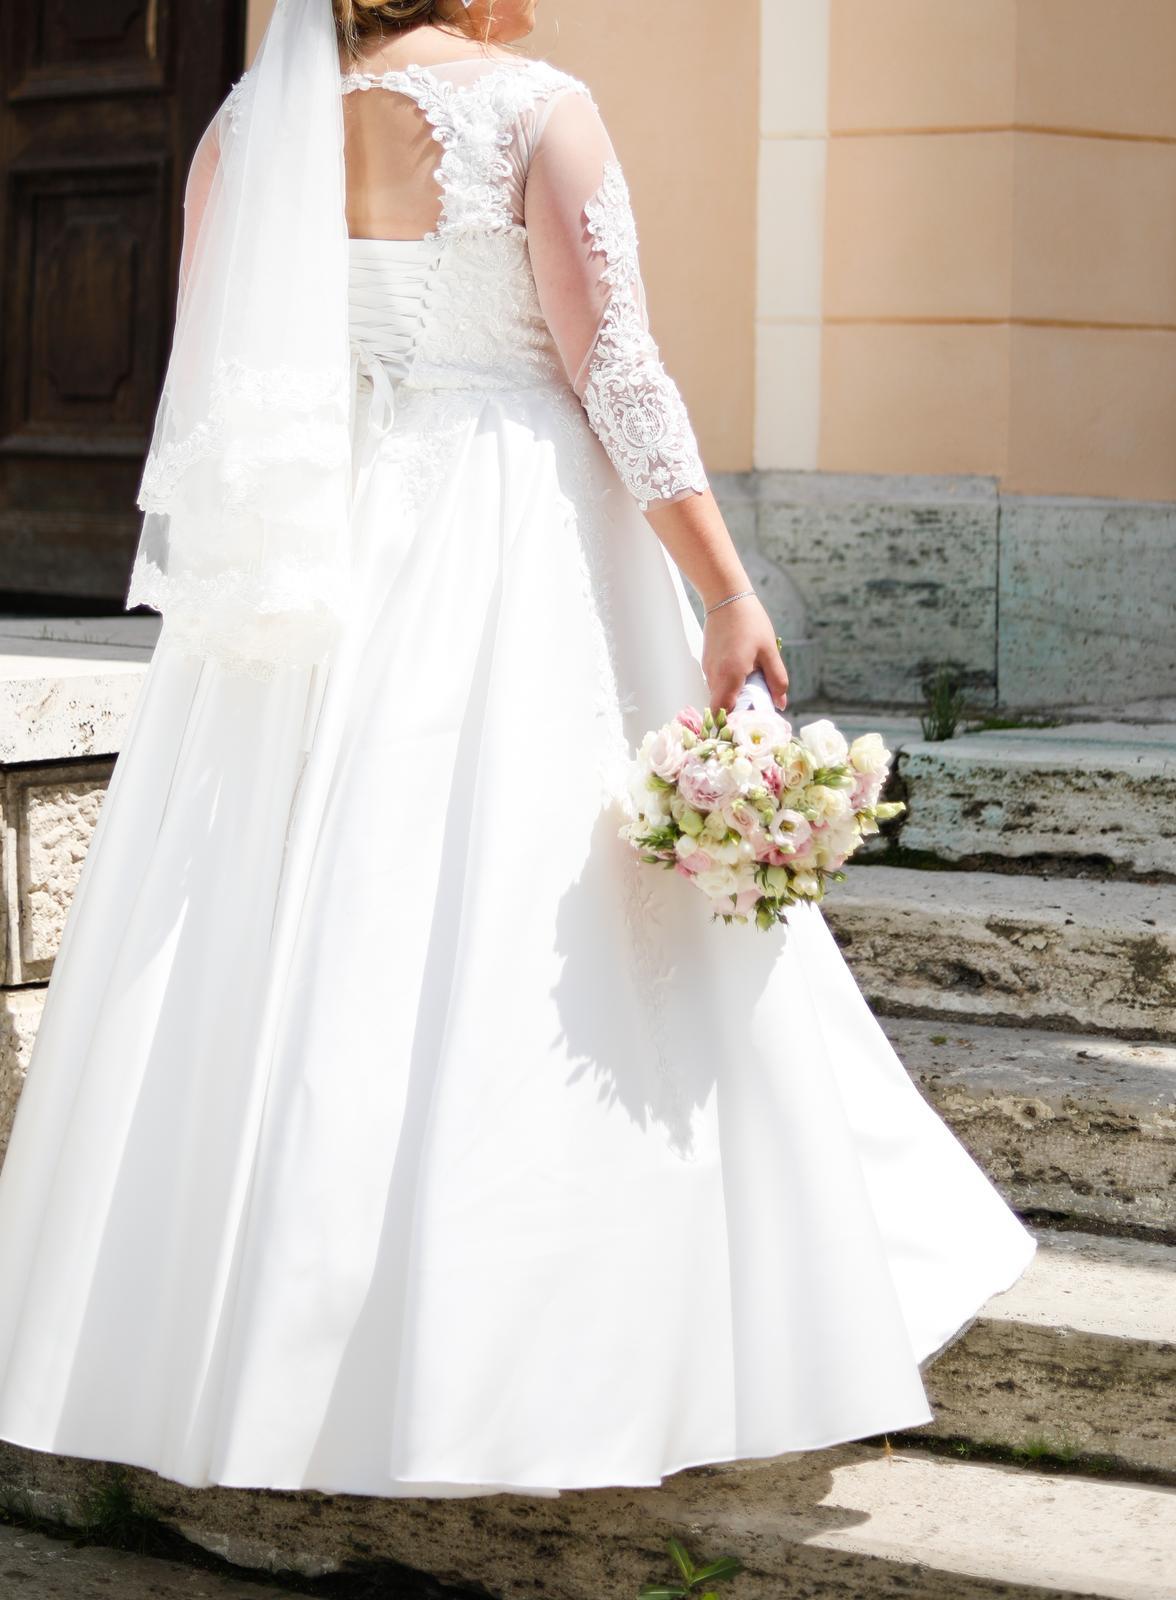 Svadobné šaty satén, čipka 46-50 - Obrázok č. 2